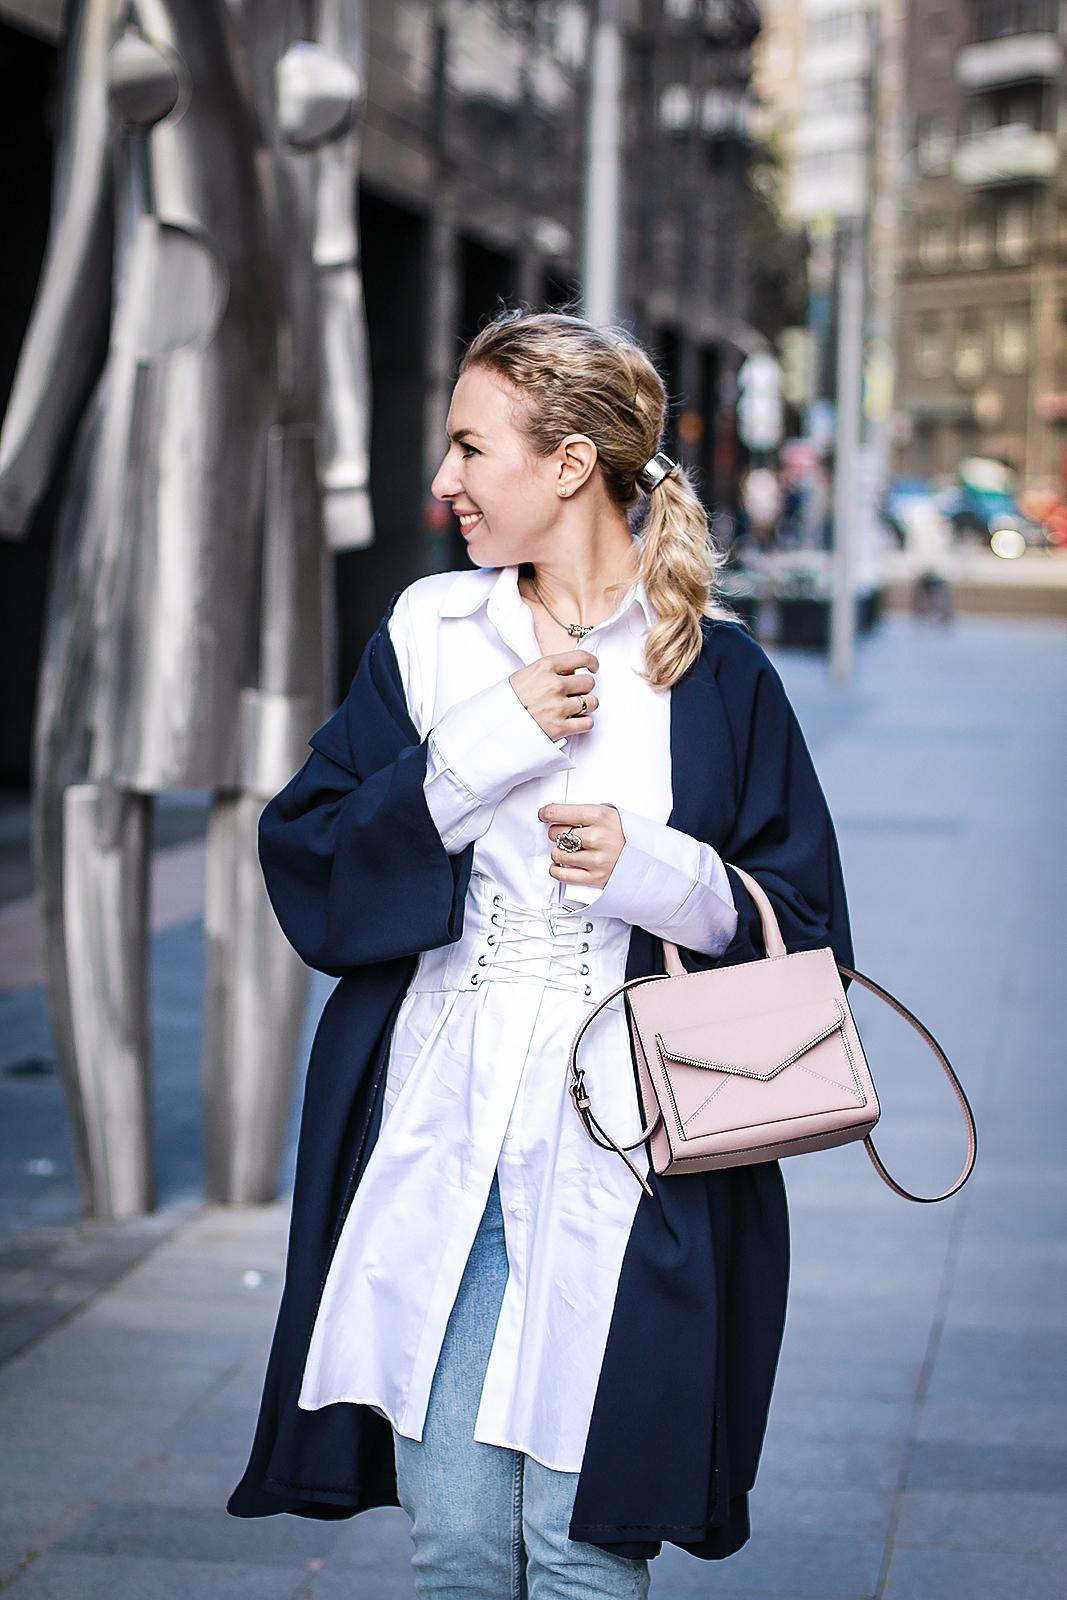 Rita_maslova_silver_mules_corset_shirt_white_russian_fashion_blogger_streetstyle